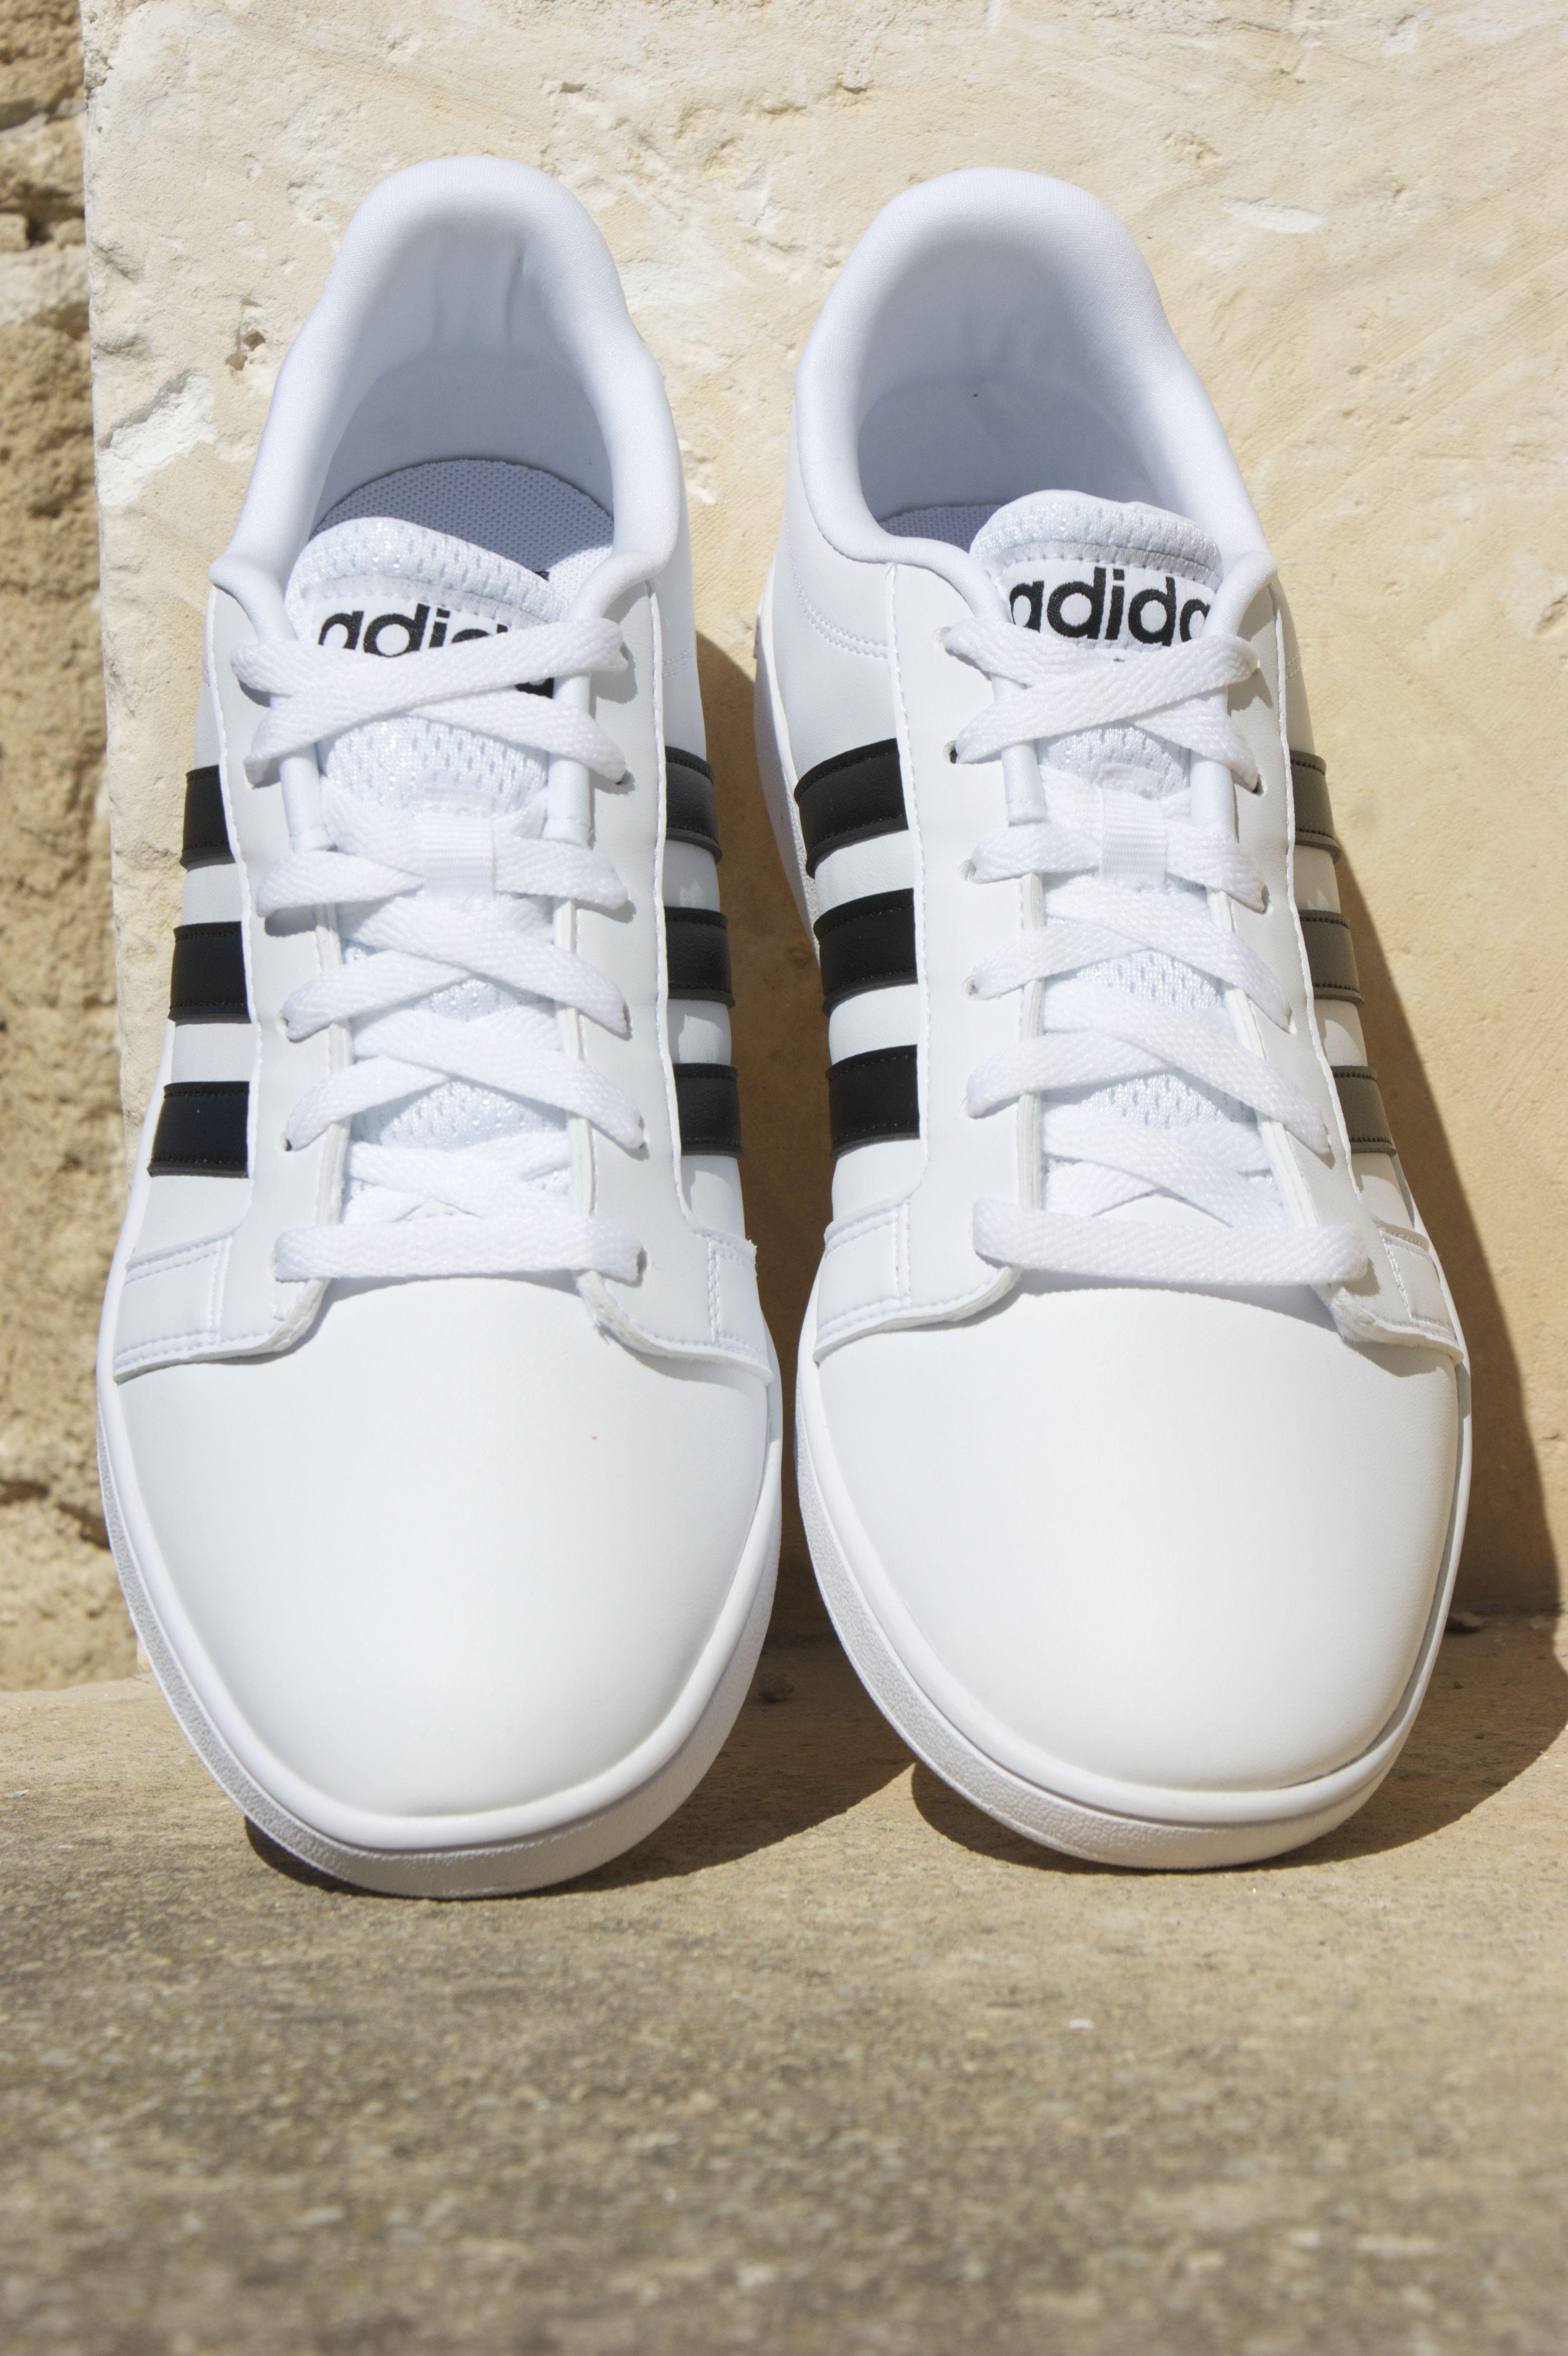 Sneakers shooting Deichmann Schuhe mallorca adidas sneaker w6UnxqXF7